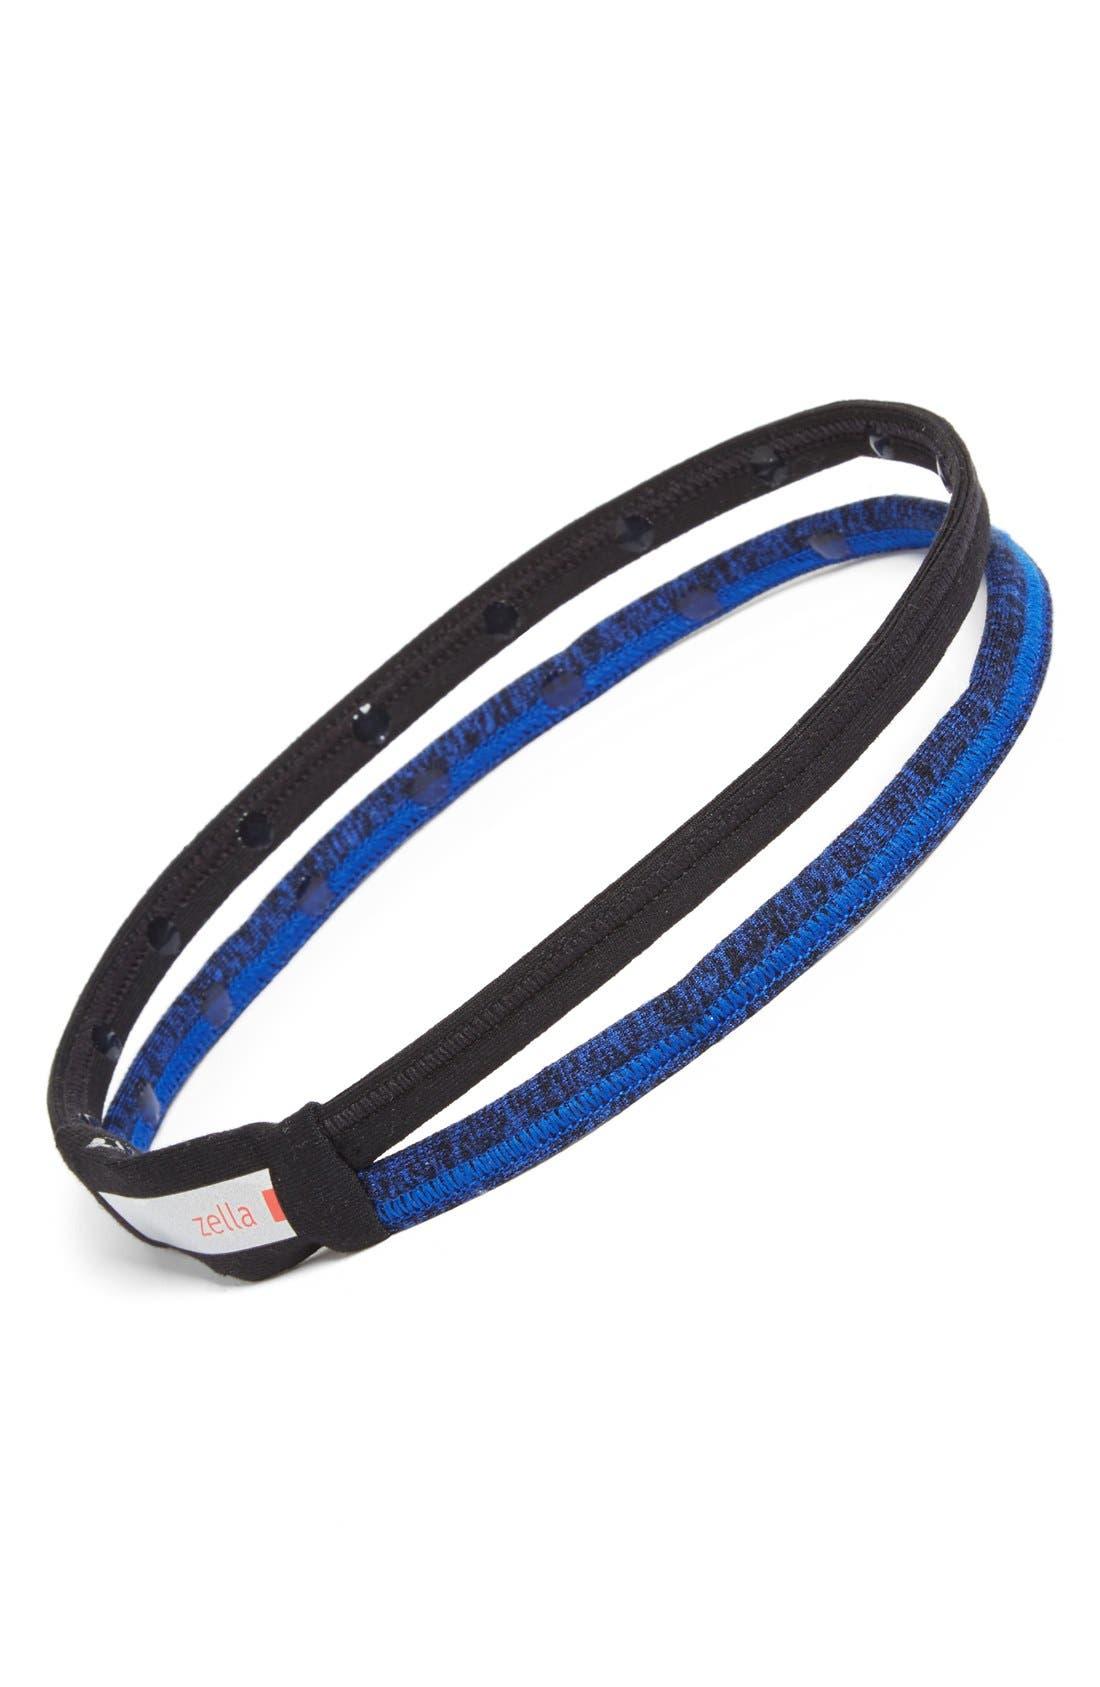 Alternate Image 1 Selected - Zella 'Double the Fun' Colorblock Headband